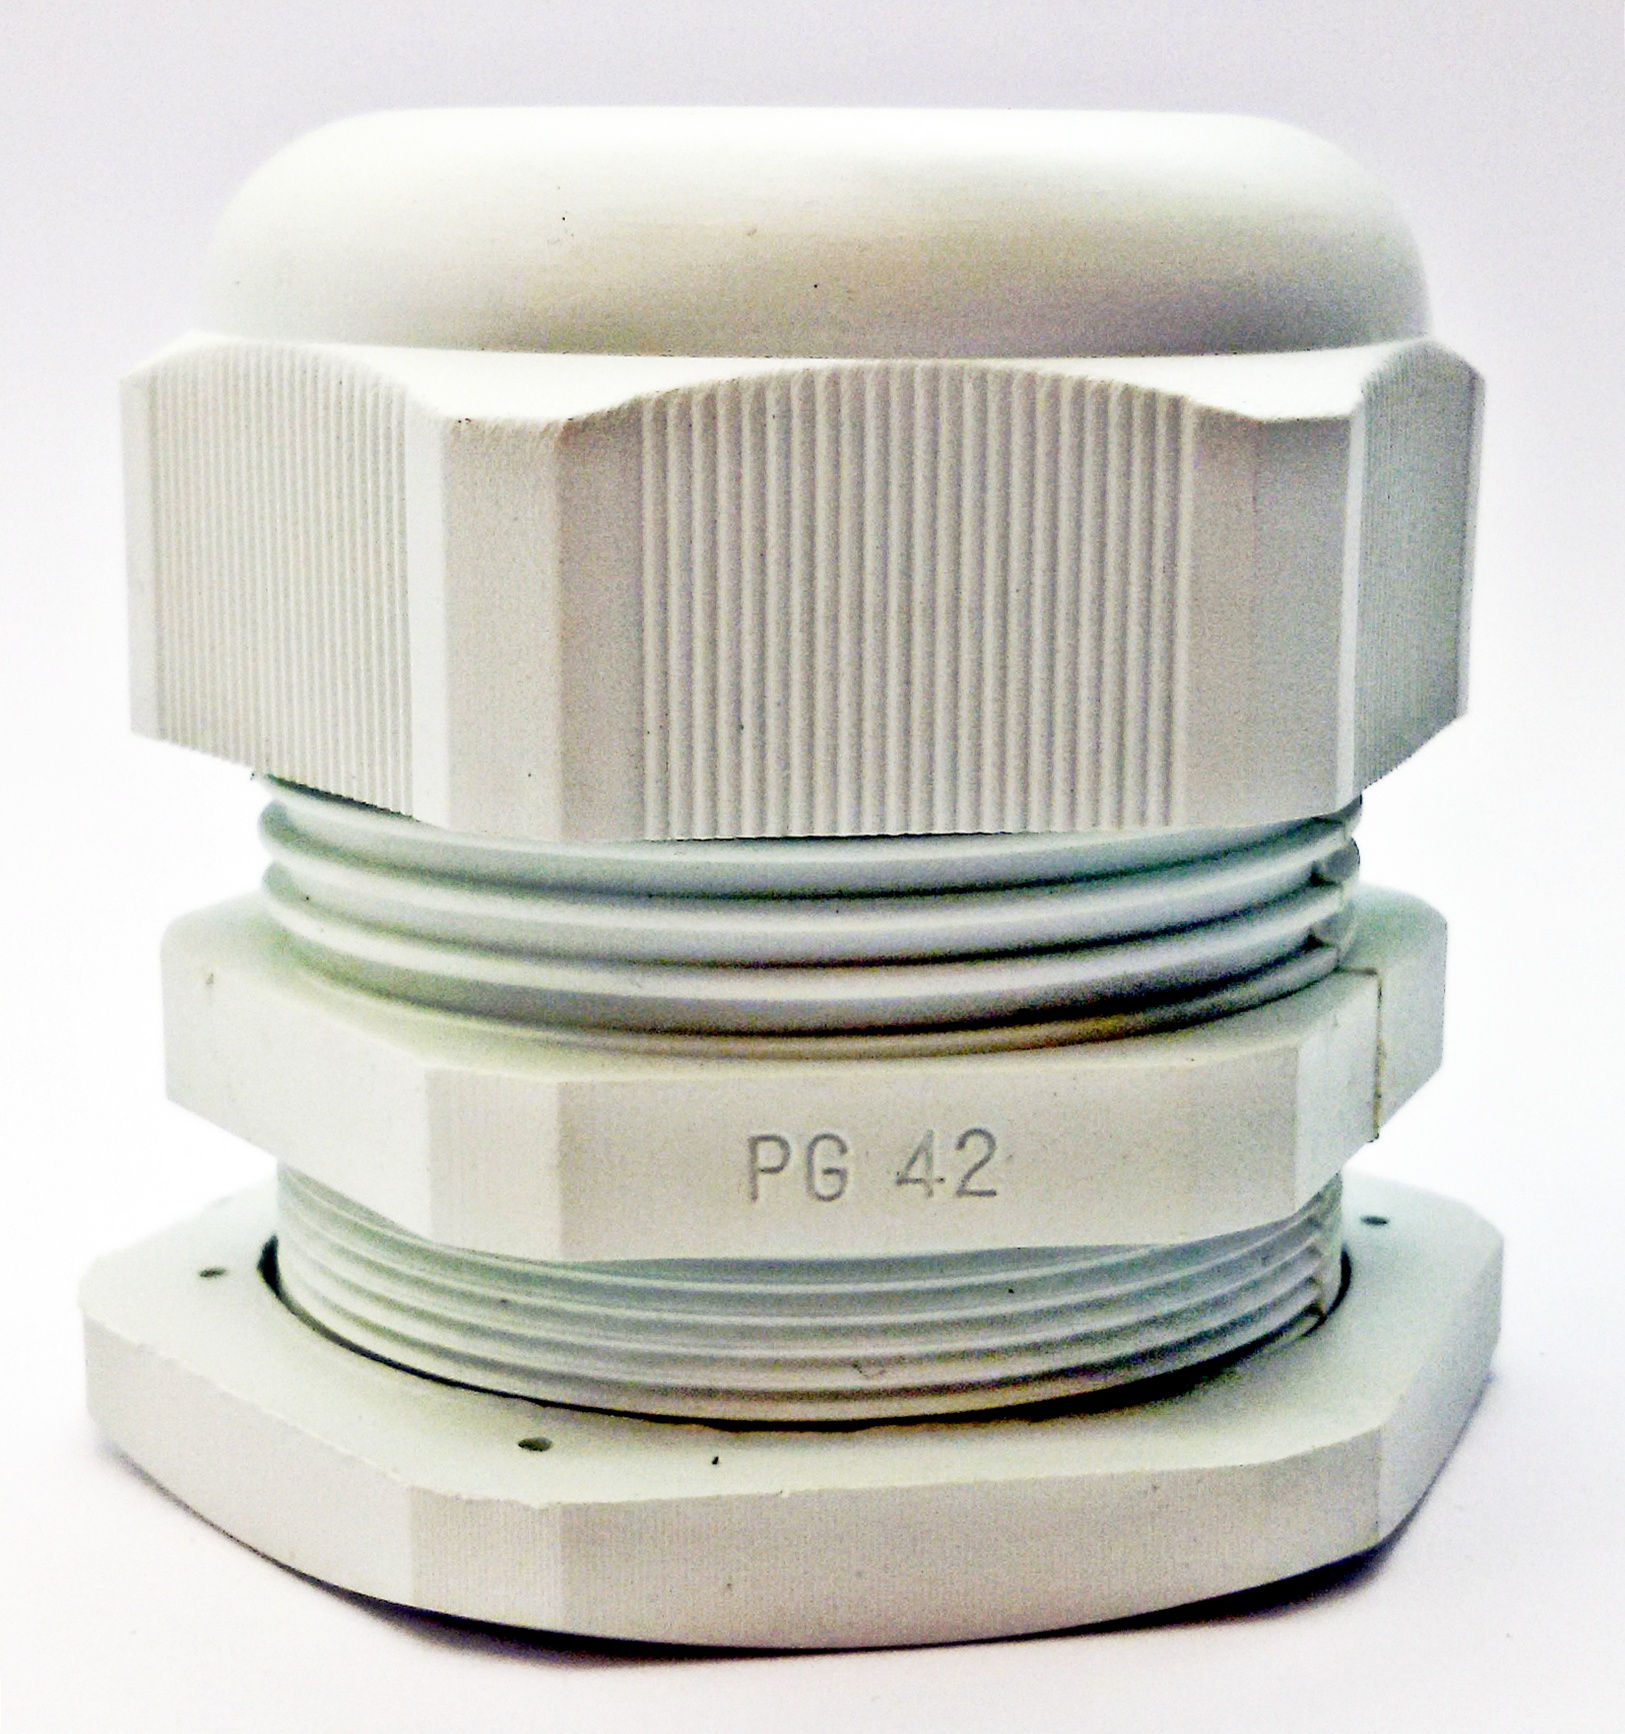 LOBO ELECTRIC CABLE GLAND PG42 32 - 38 mm. สีขาว